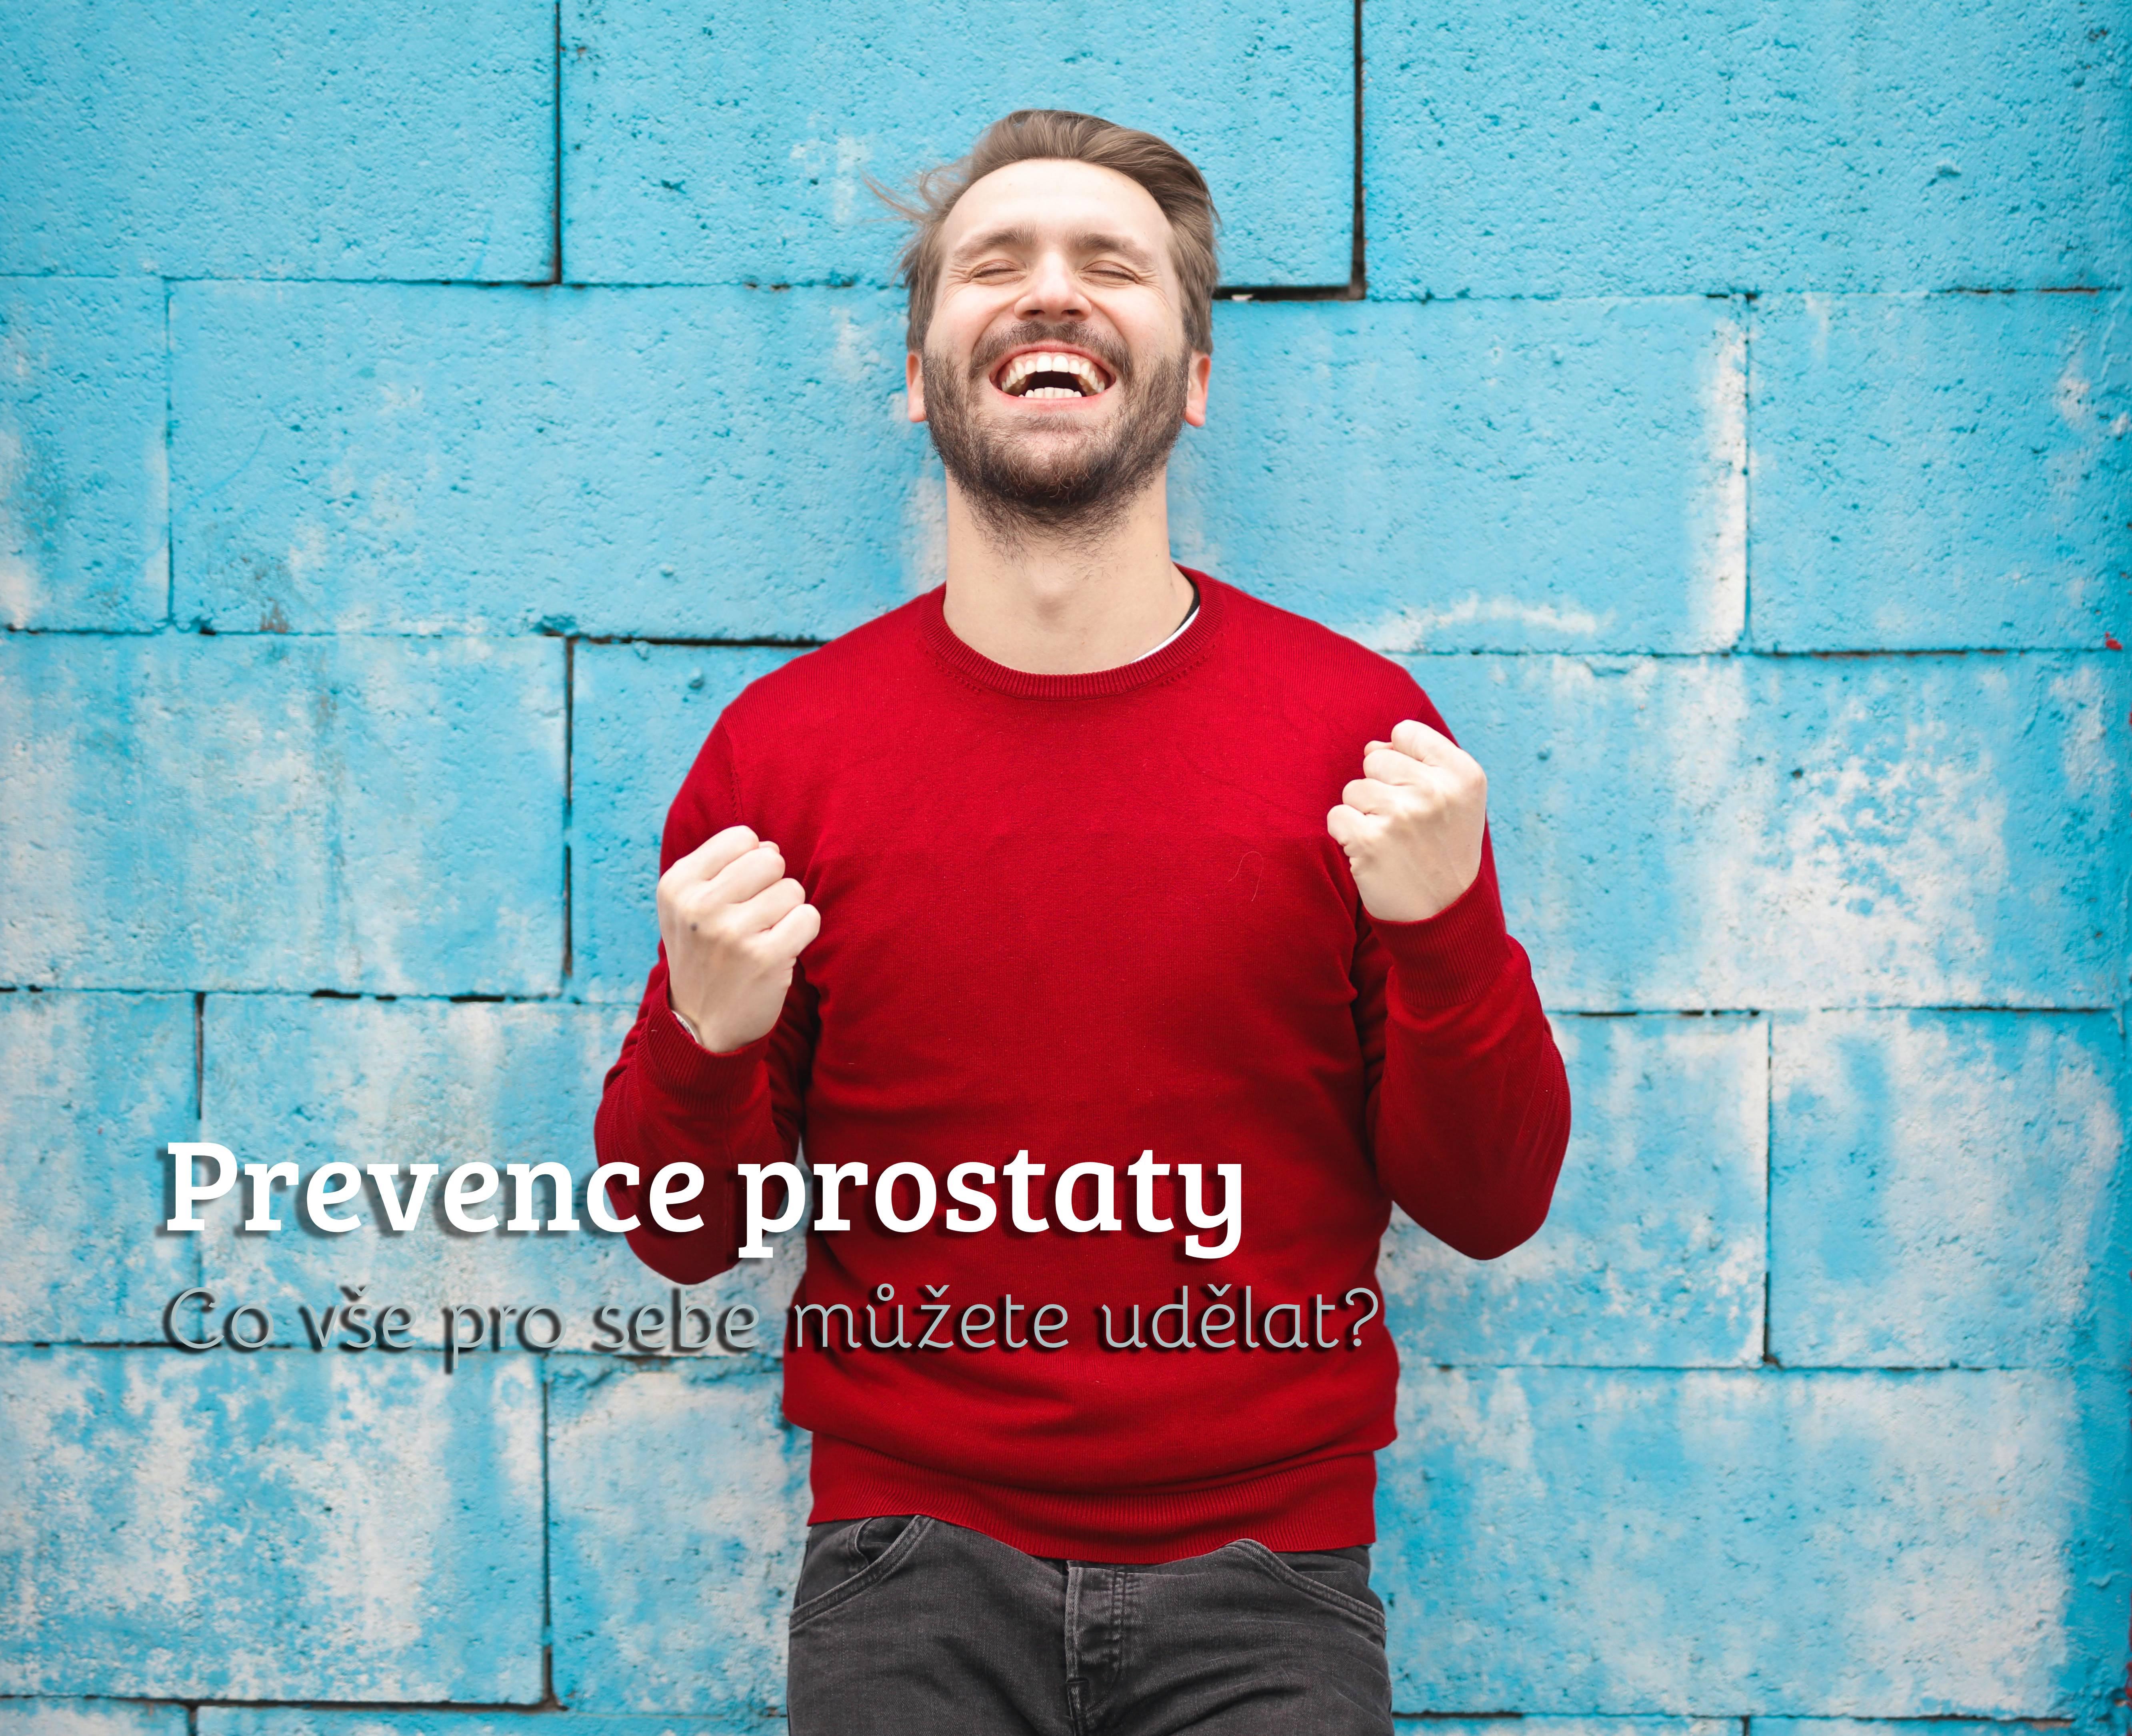 Prevence prostaty